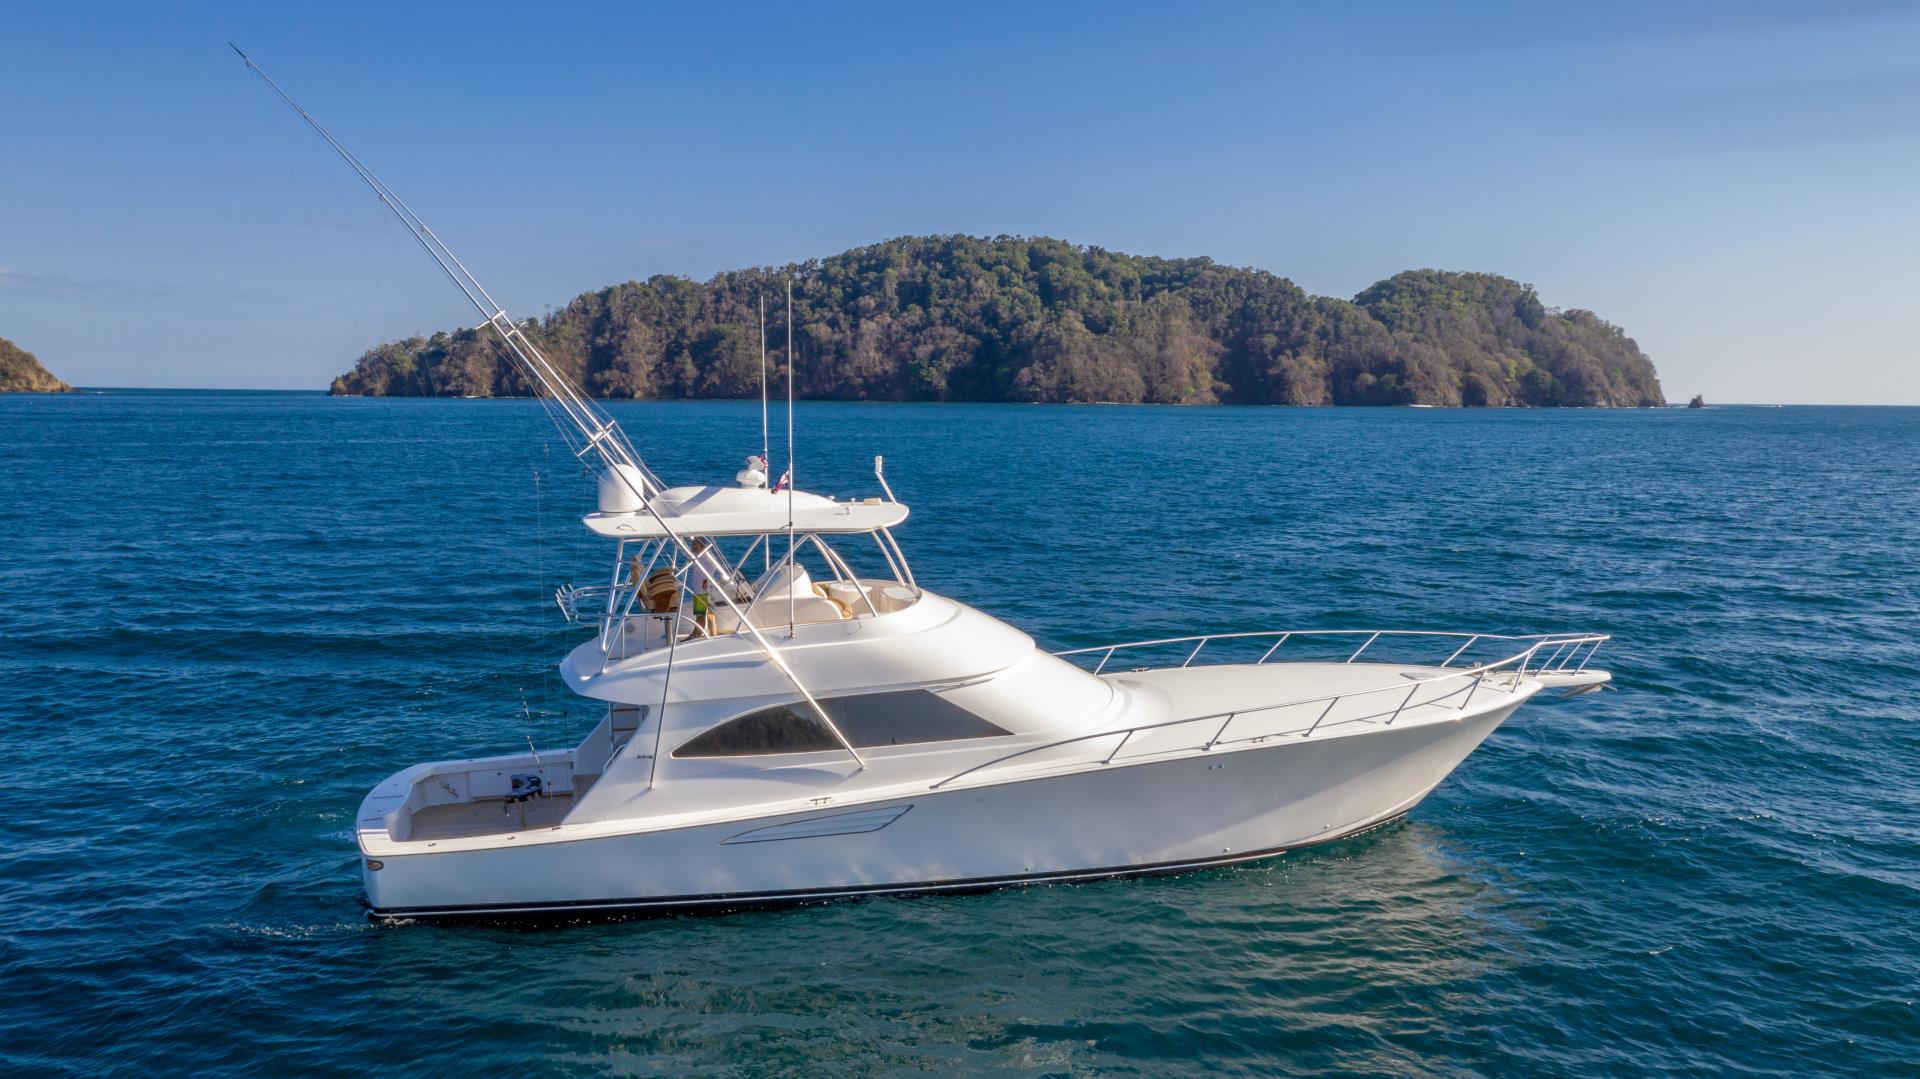 Viking-62 Convertible 2014-Mixer Playa Herradura, Los Suenos,-Costa Rica-2014 Viking 62 Convertible  Mixer-1356206 | Thumbnail